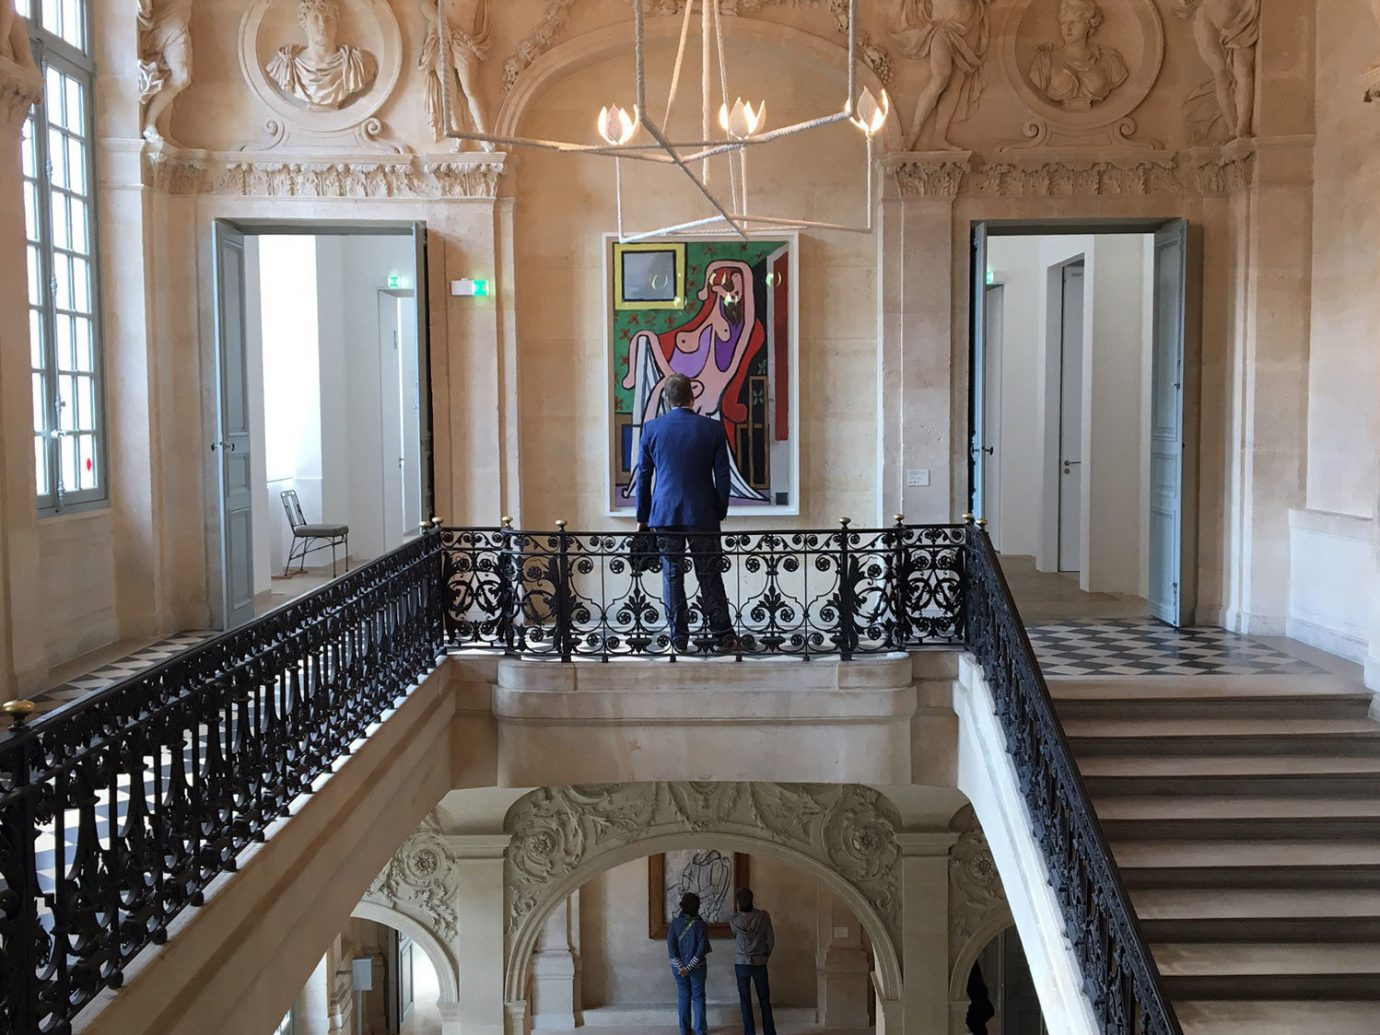 France Paris Trip Ideas indoor room window ceiling estate Lobby interior design mansion palace hall chapel ballroom dining room